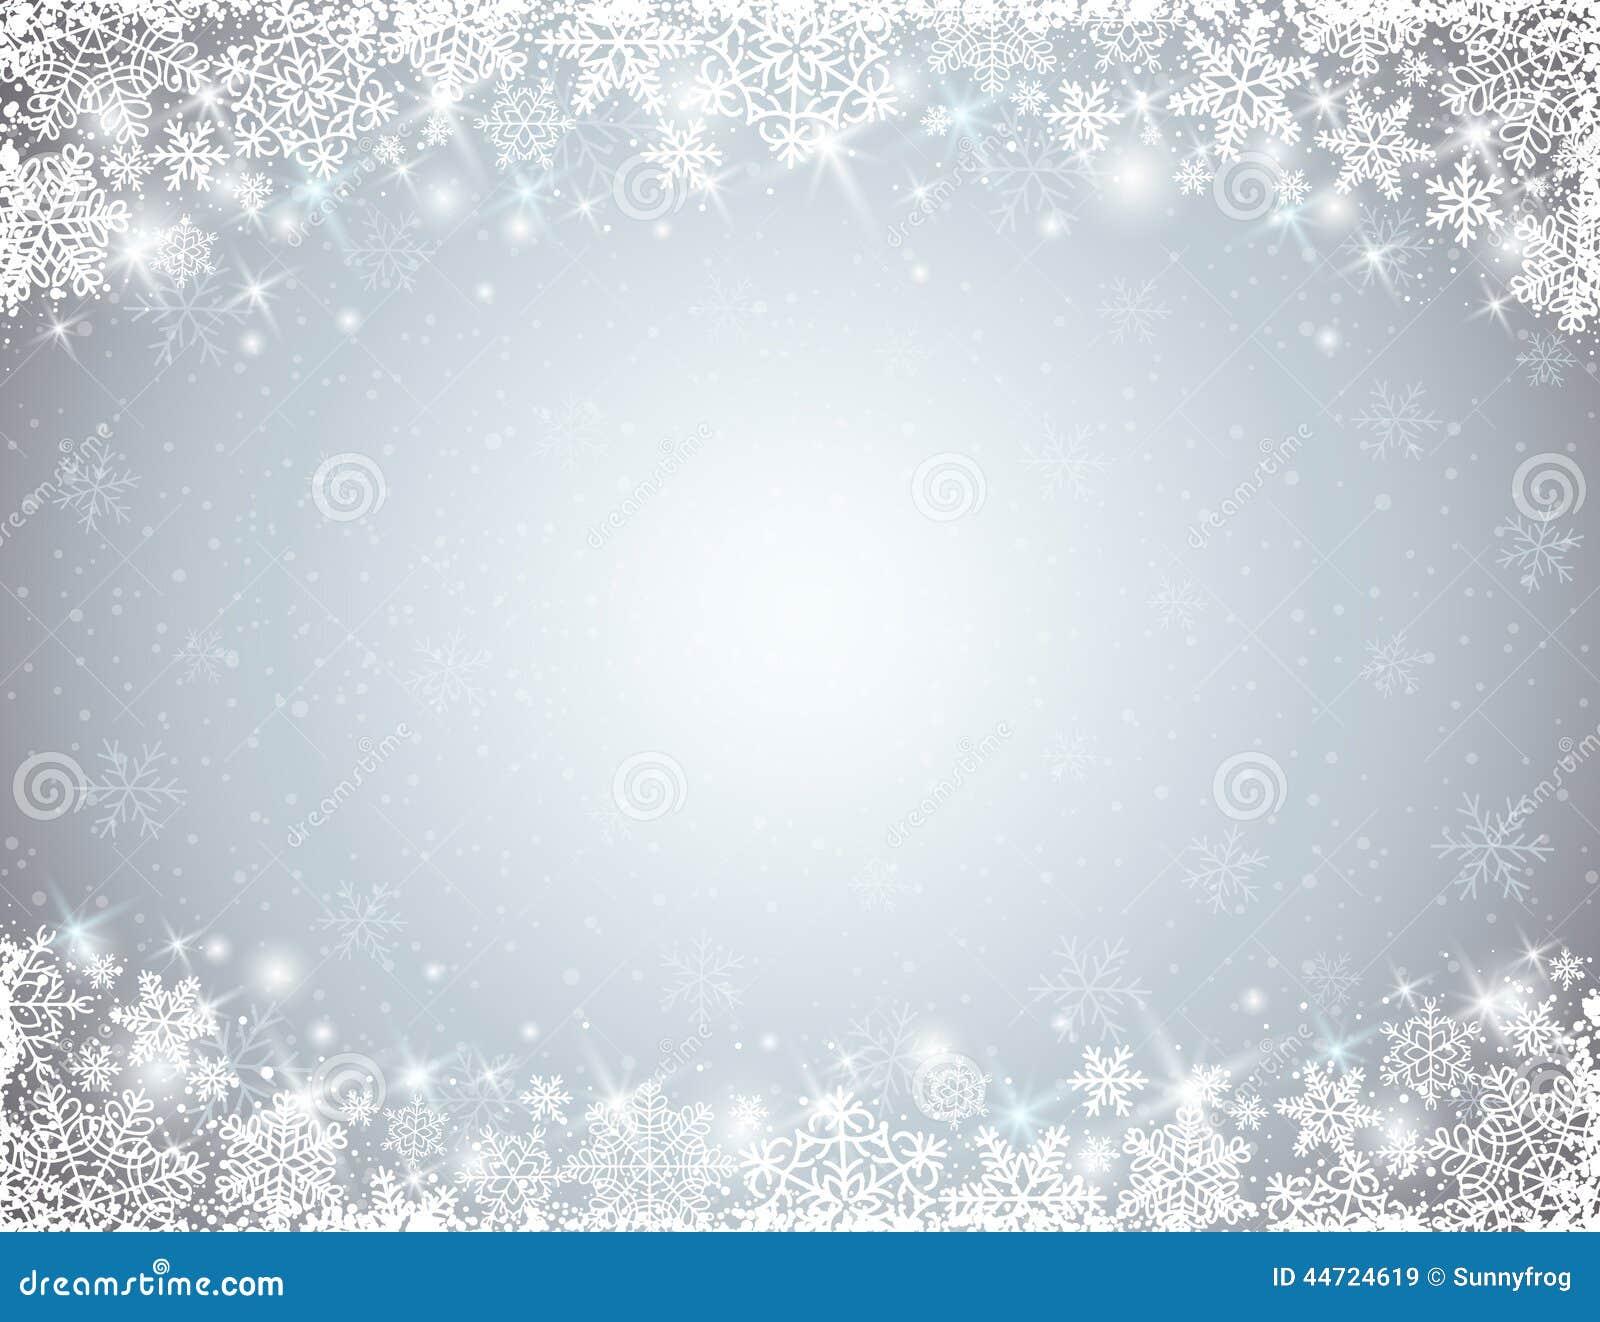 POTD Spikes Snowflake Surprise  The Firearm BlogThe